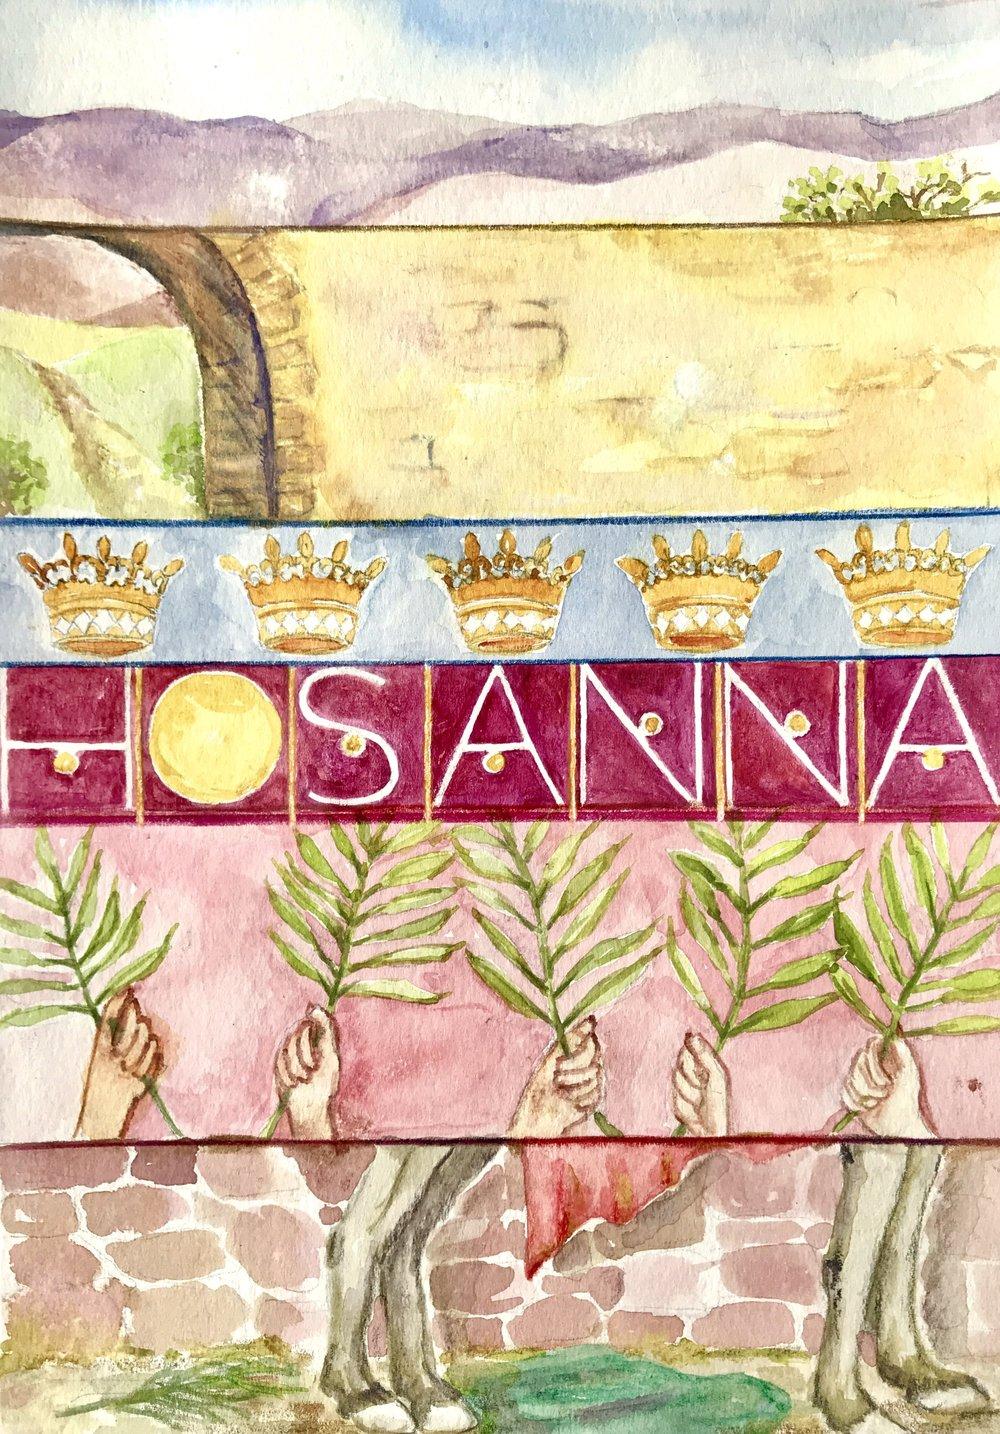 Hosanna Edited.jpg